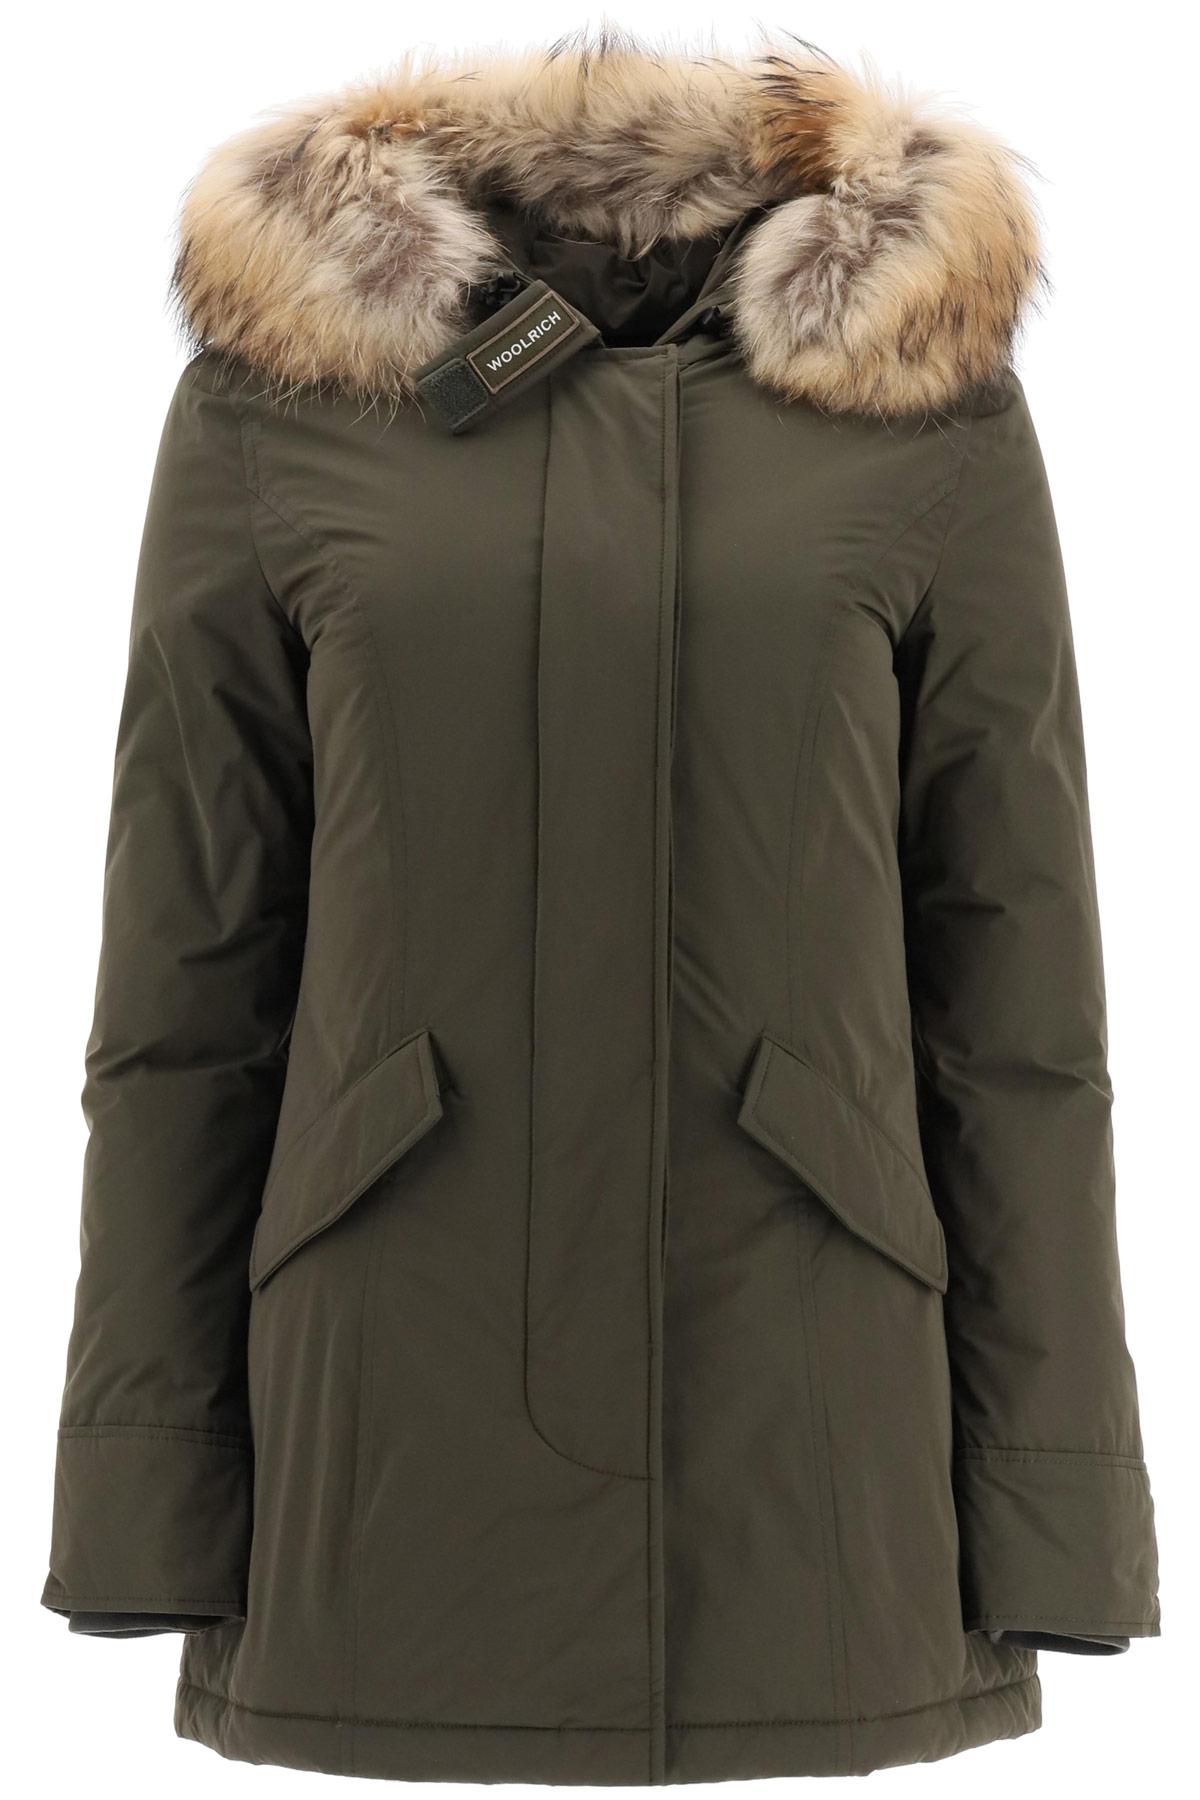 WOOLRICH LUXURY ARCTIC PARKA WITH MURMASKY FUR M Green Technical, Fur